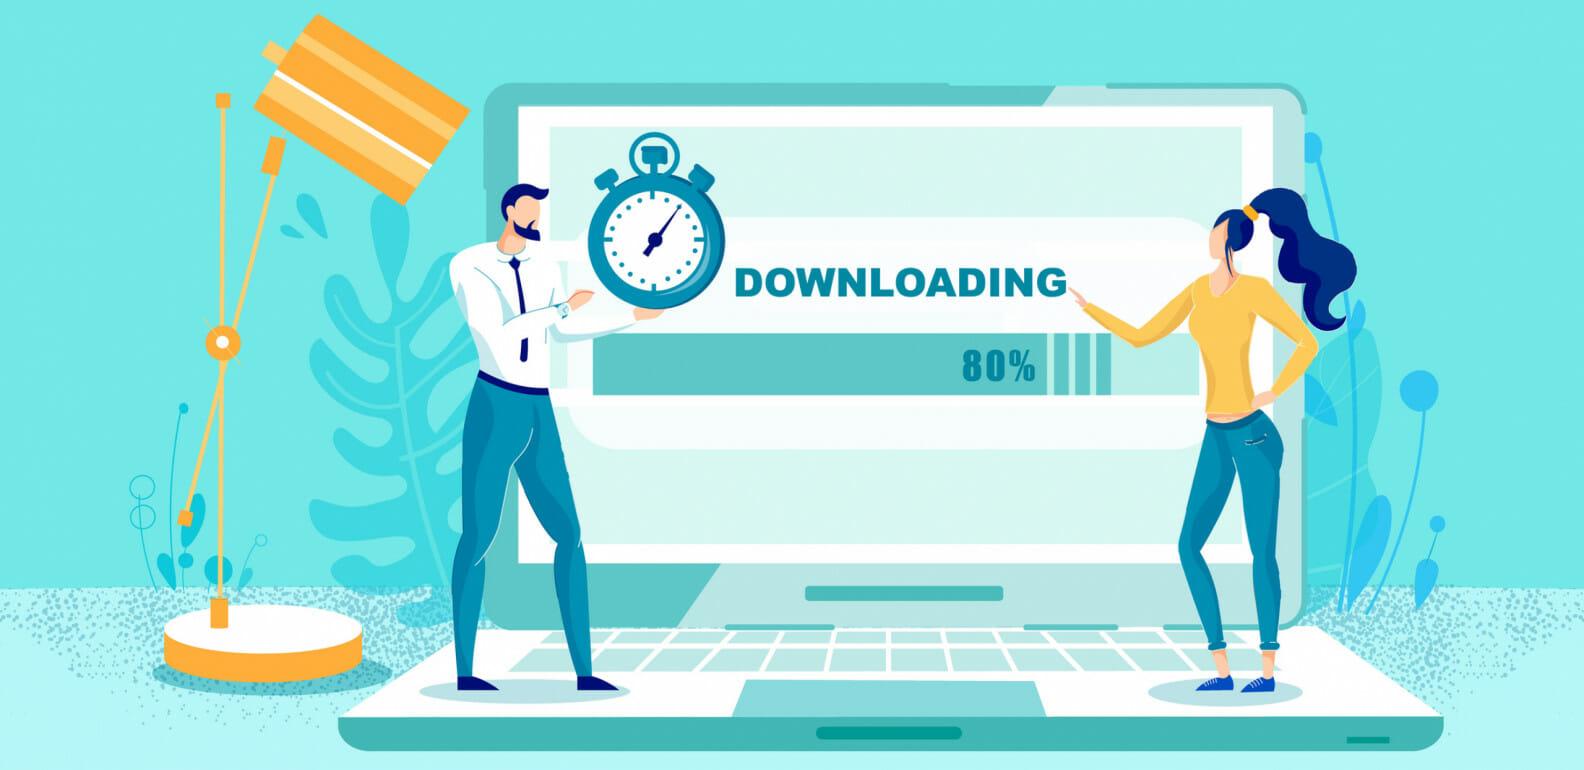 Top 5 Usenet Providers